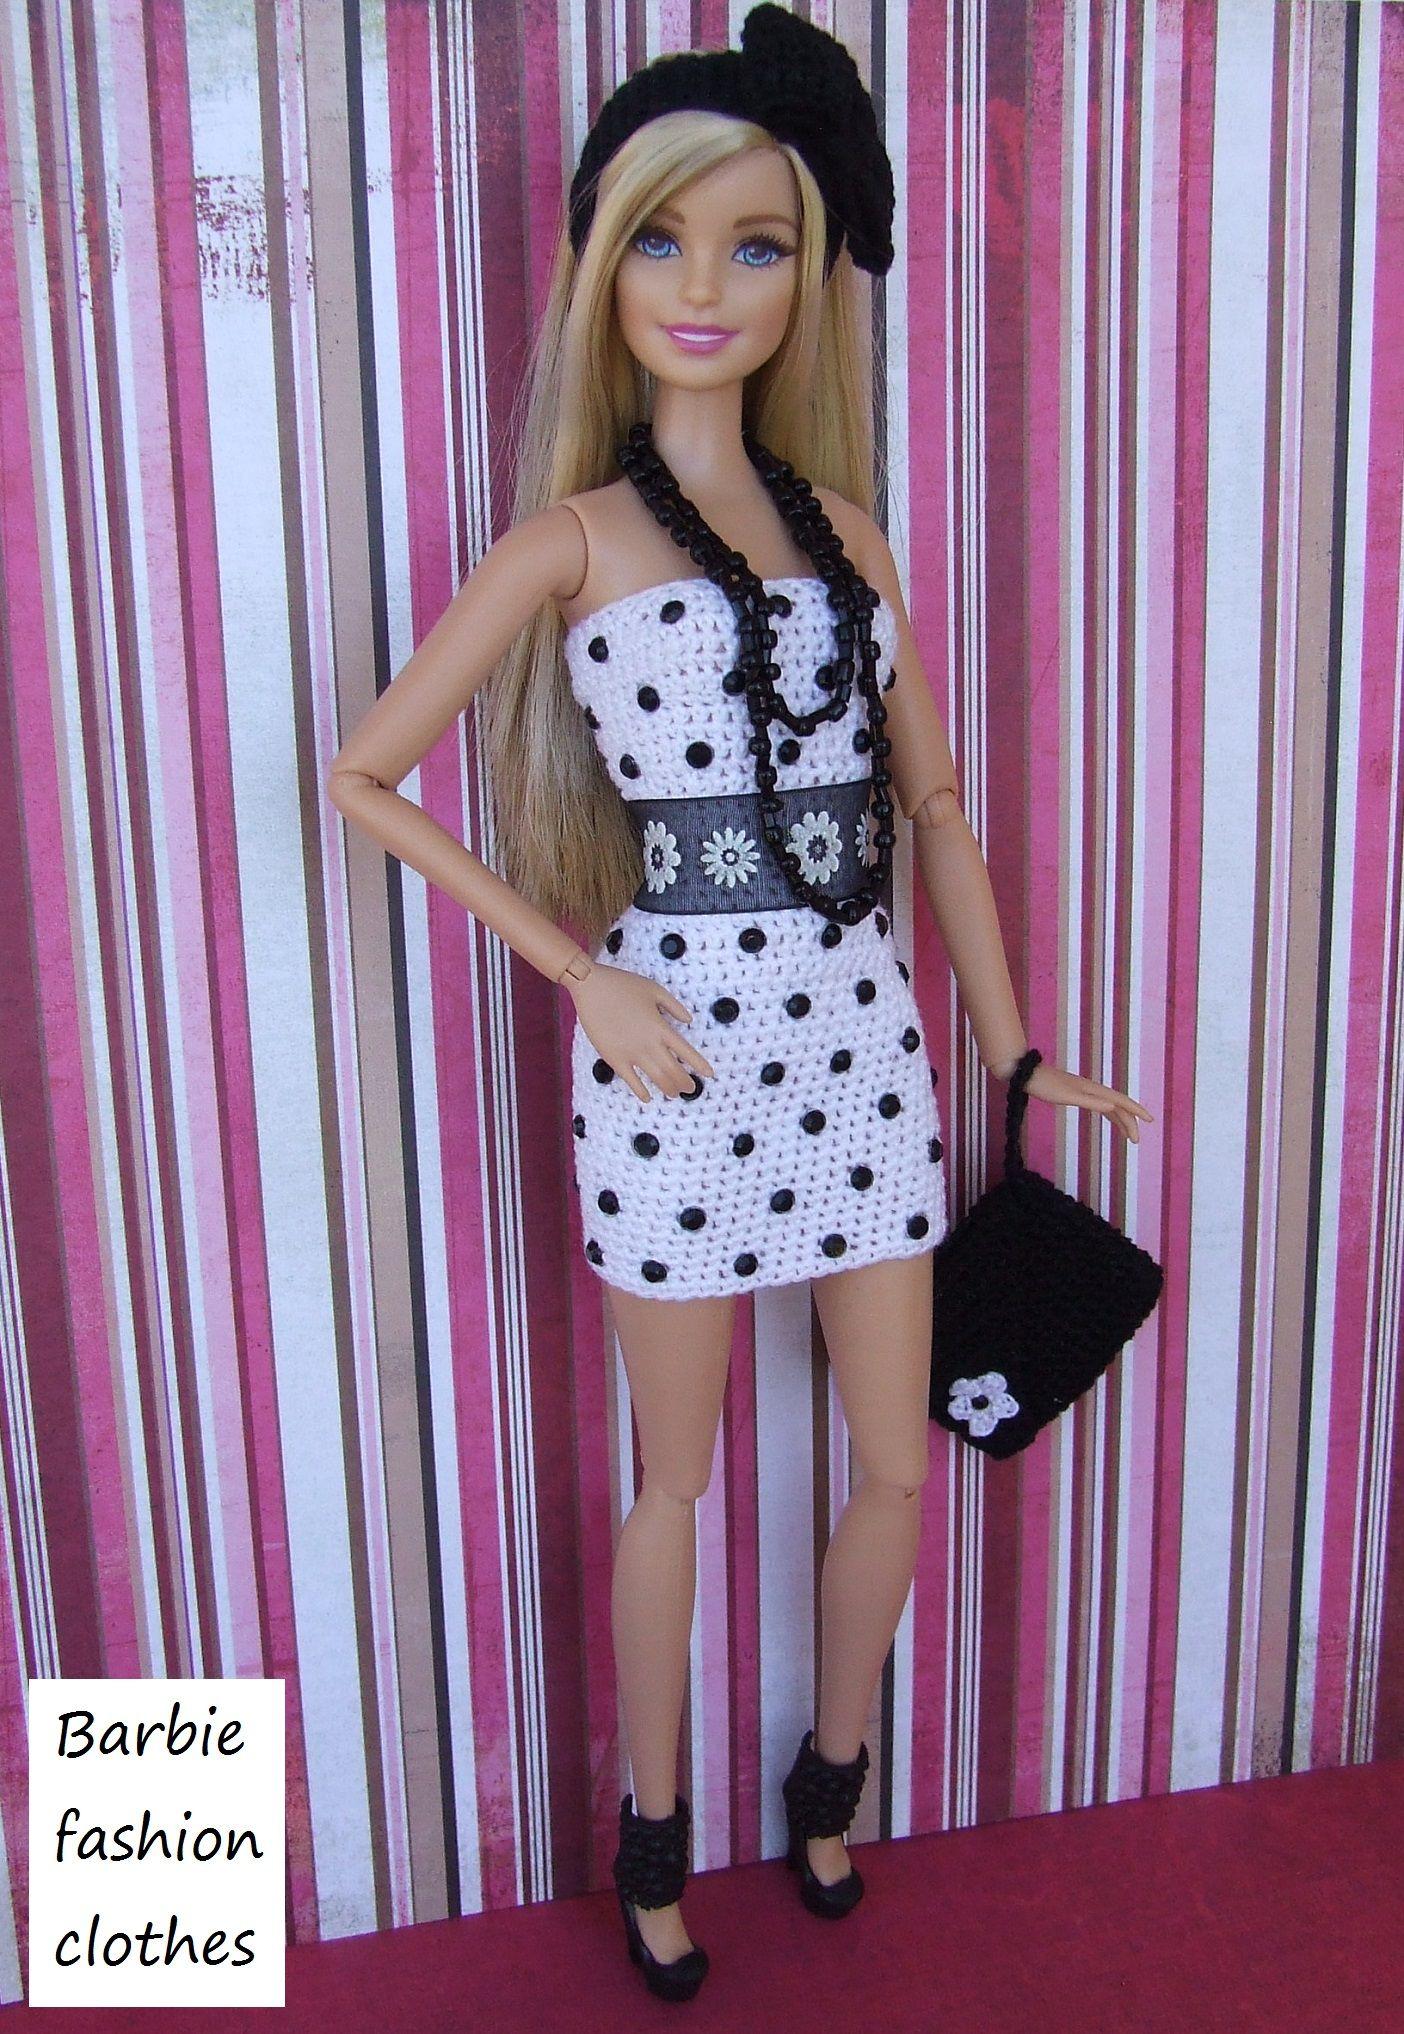 Pin von Anel Lombard auf Barbie fashion clothes | Pinterest | Barbie ...